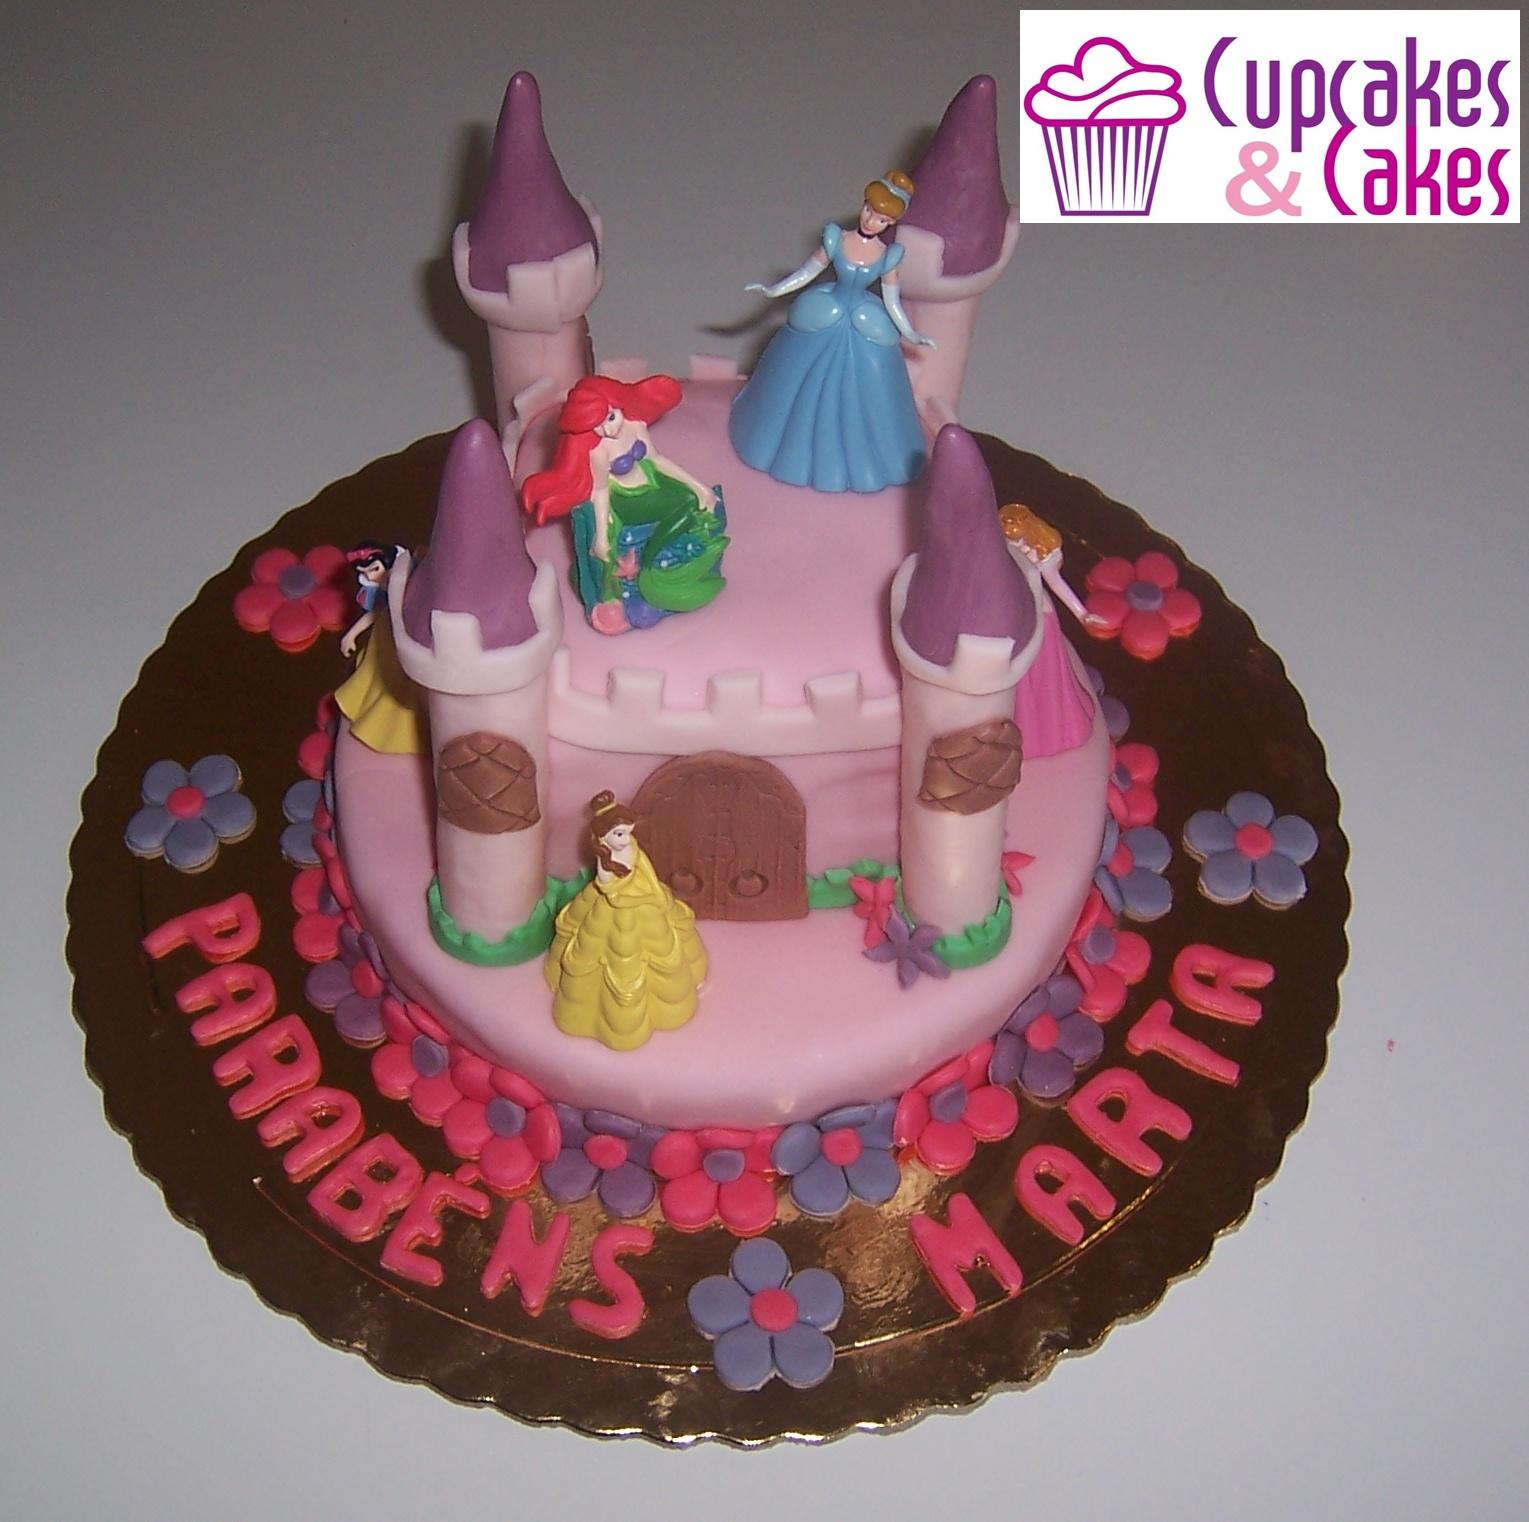 Cupcakes Cakes Bolo Anivers Rio Marta